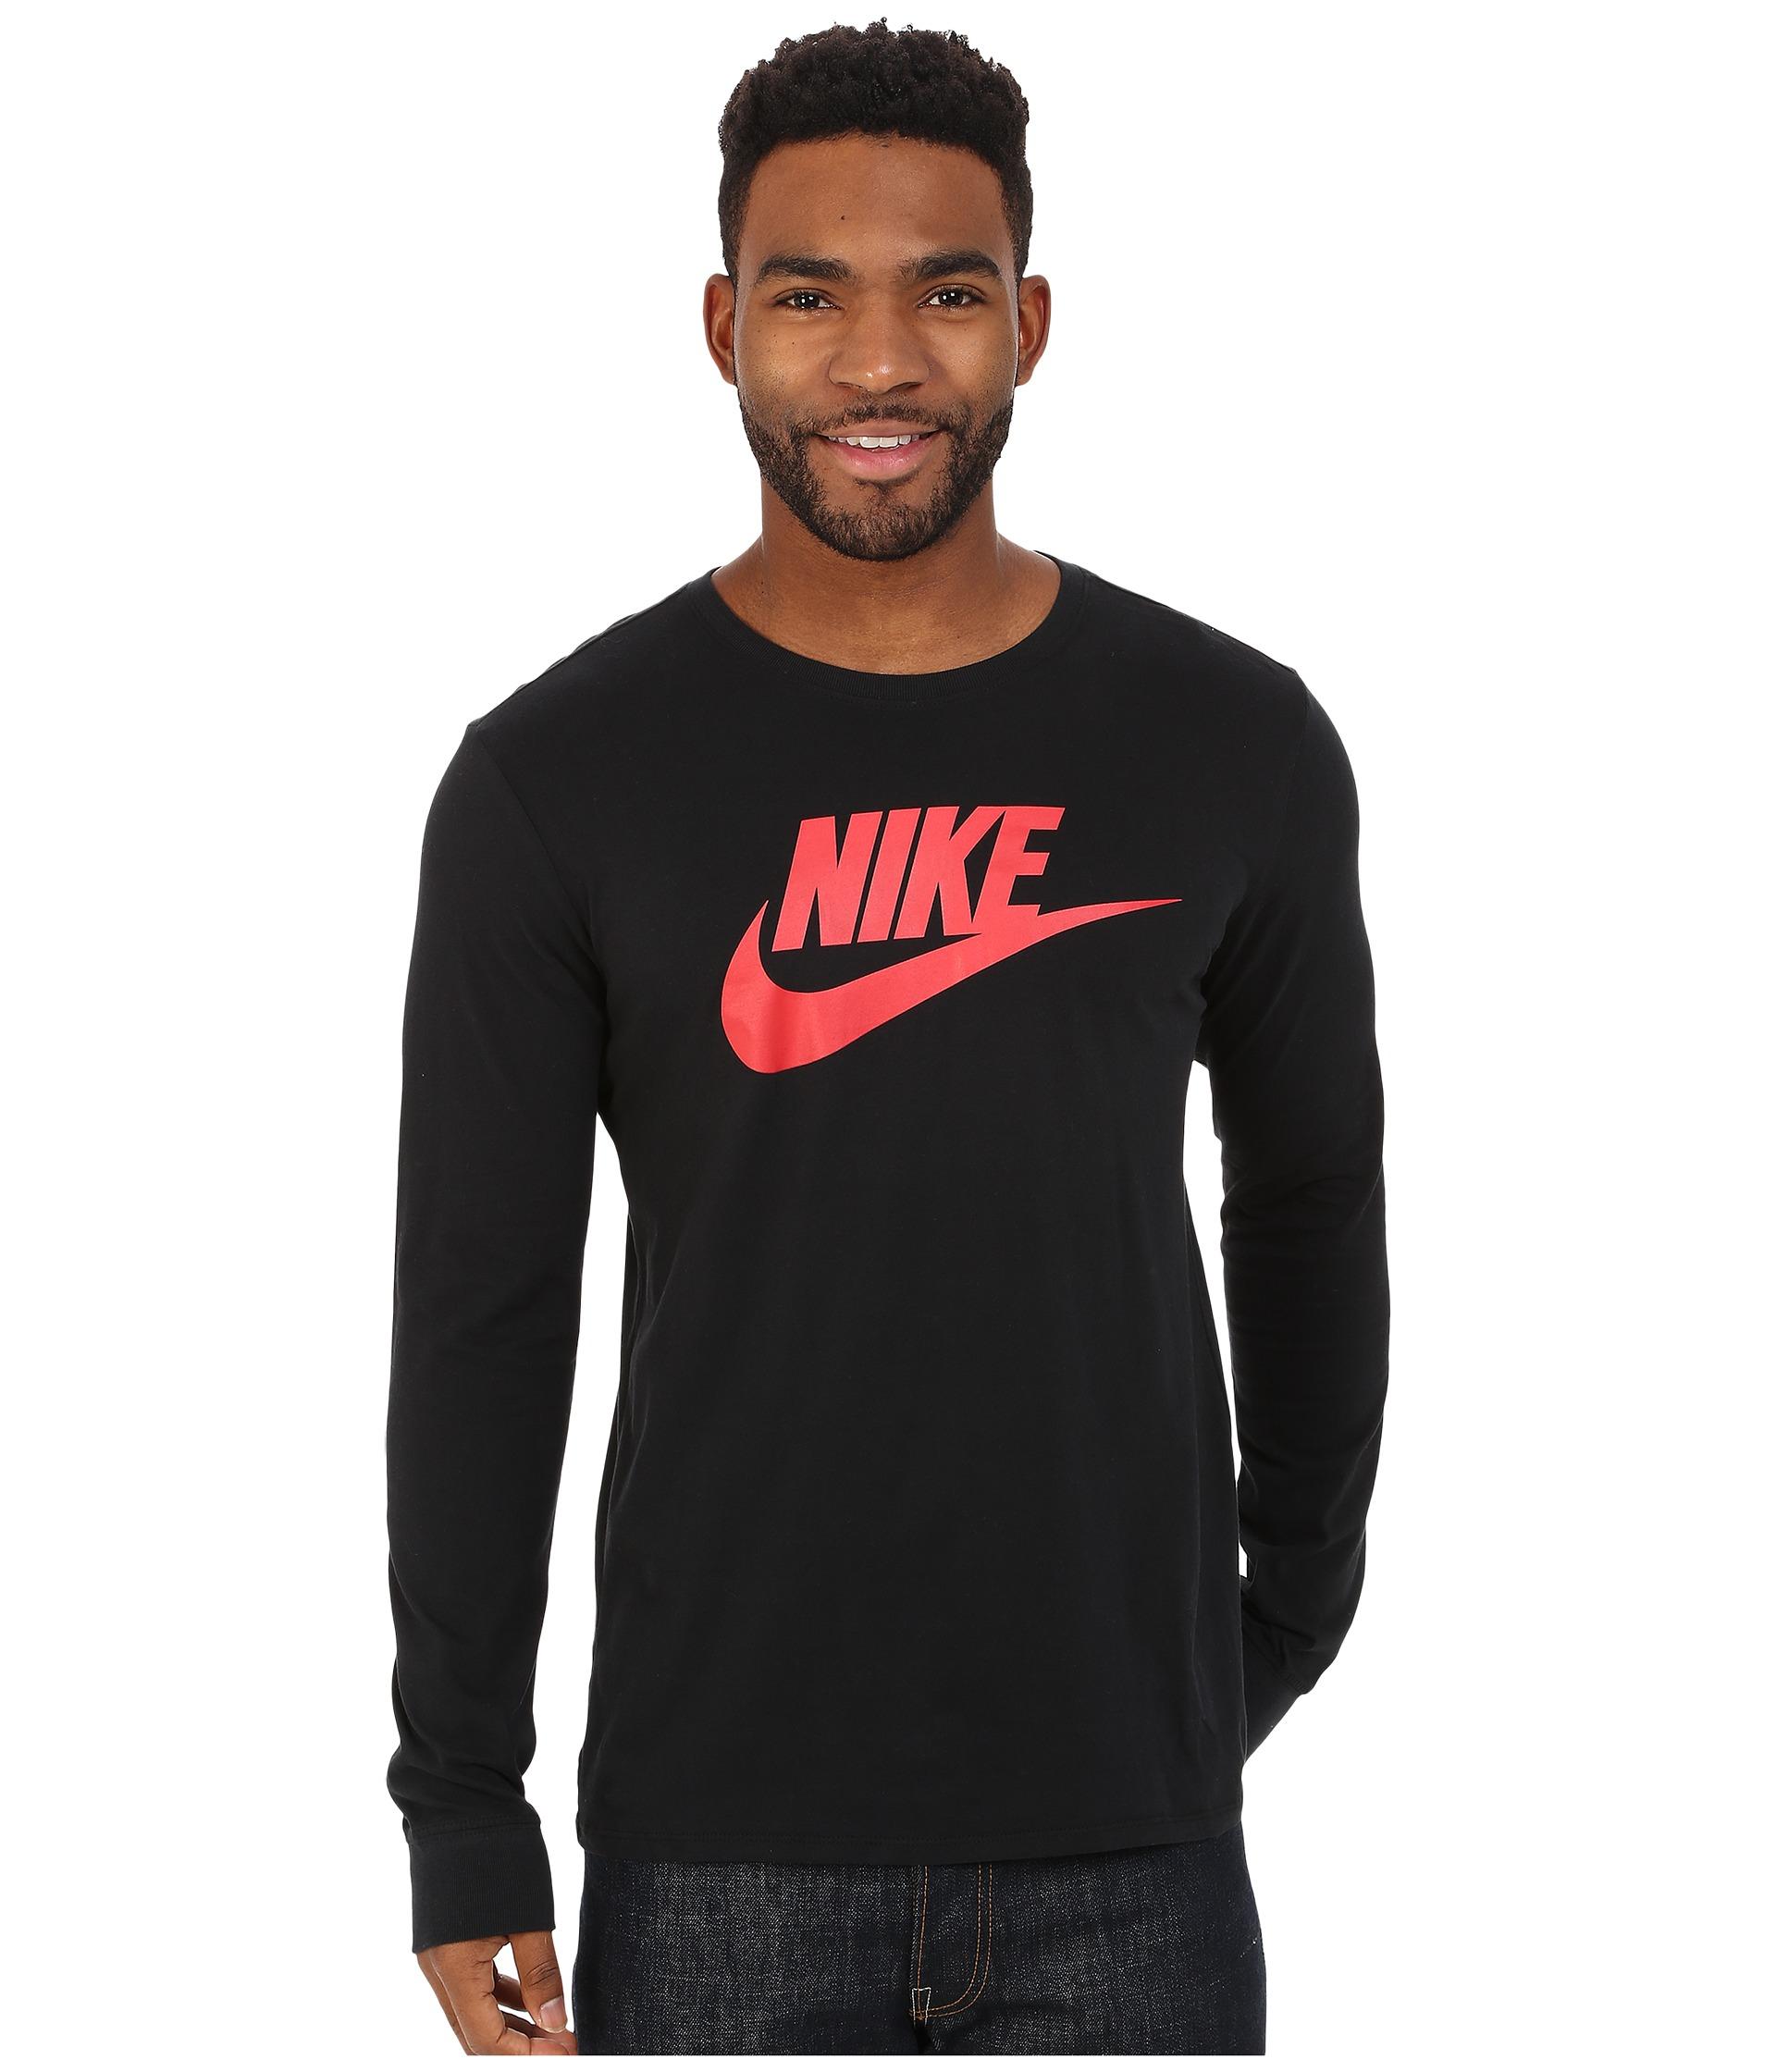 c79cd3869f93 Lyst - Nike Futura Icon Long Sleeve Tee in Black for Men